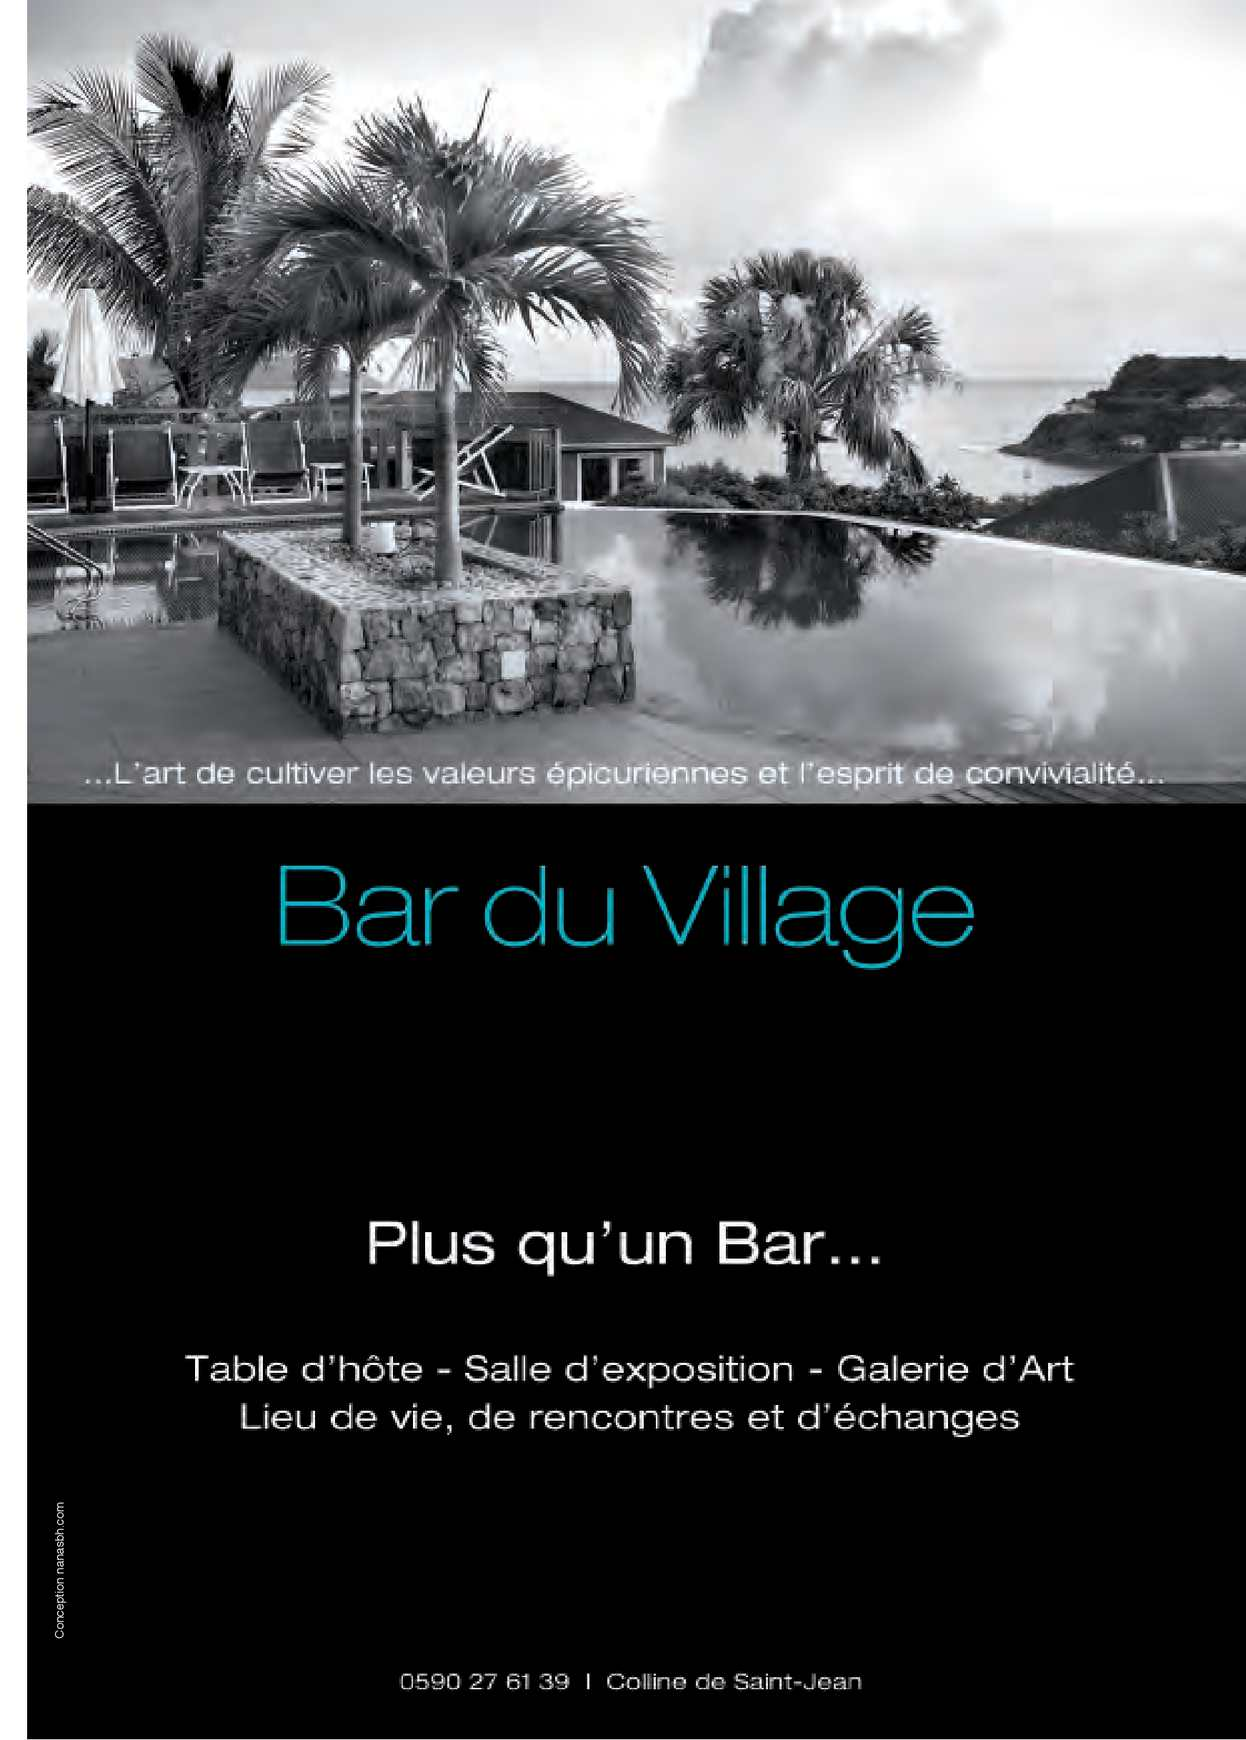 site de rencontre homme gay vacation rentals a Saint Martin dHeres